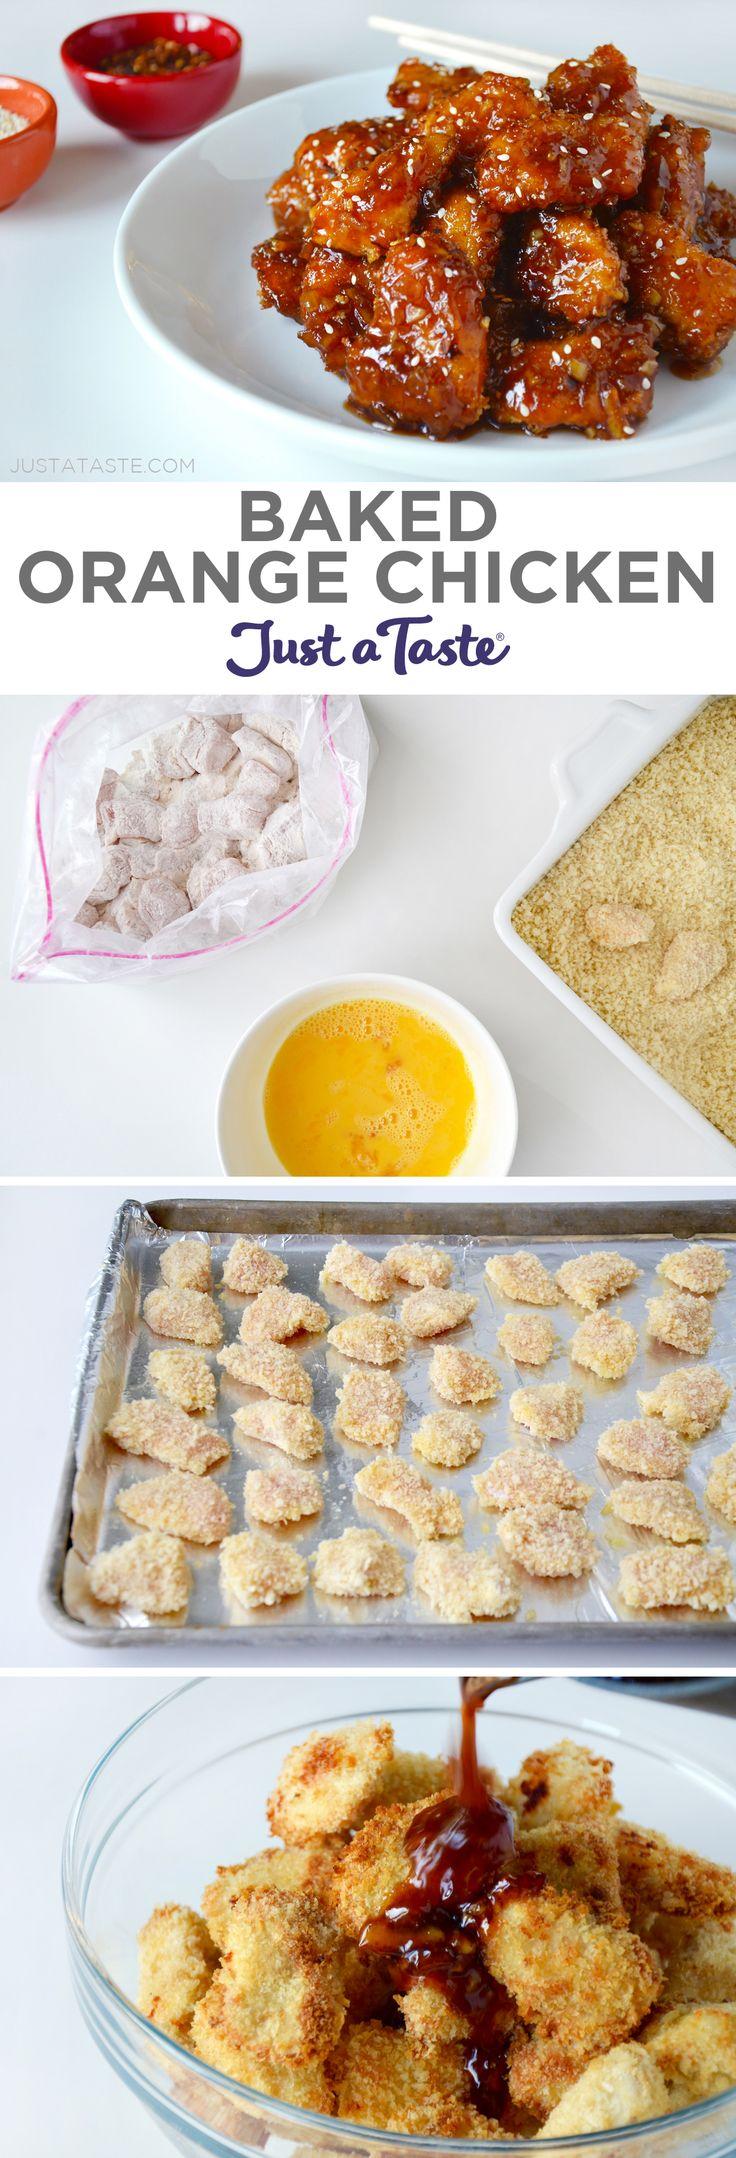 Baked Orange Chicken recipe from justataste.com #chicken #recipe | https://lomejordelaweb.es/